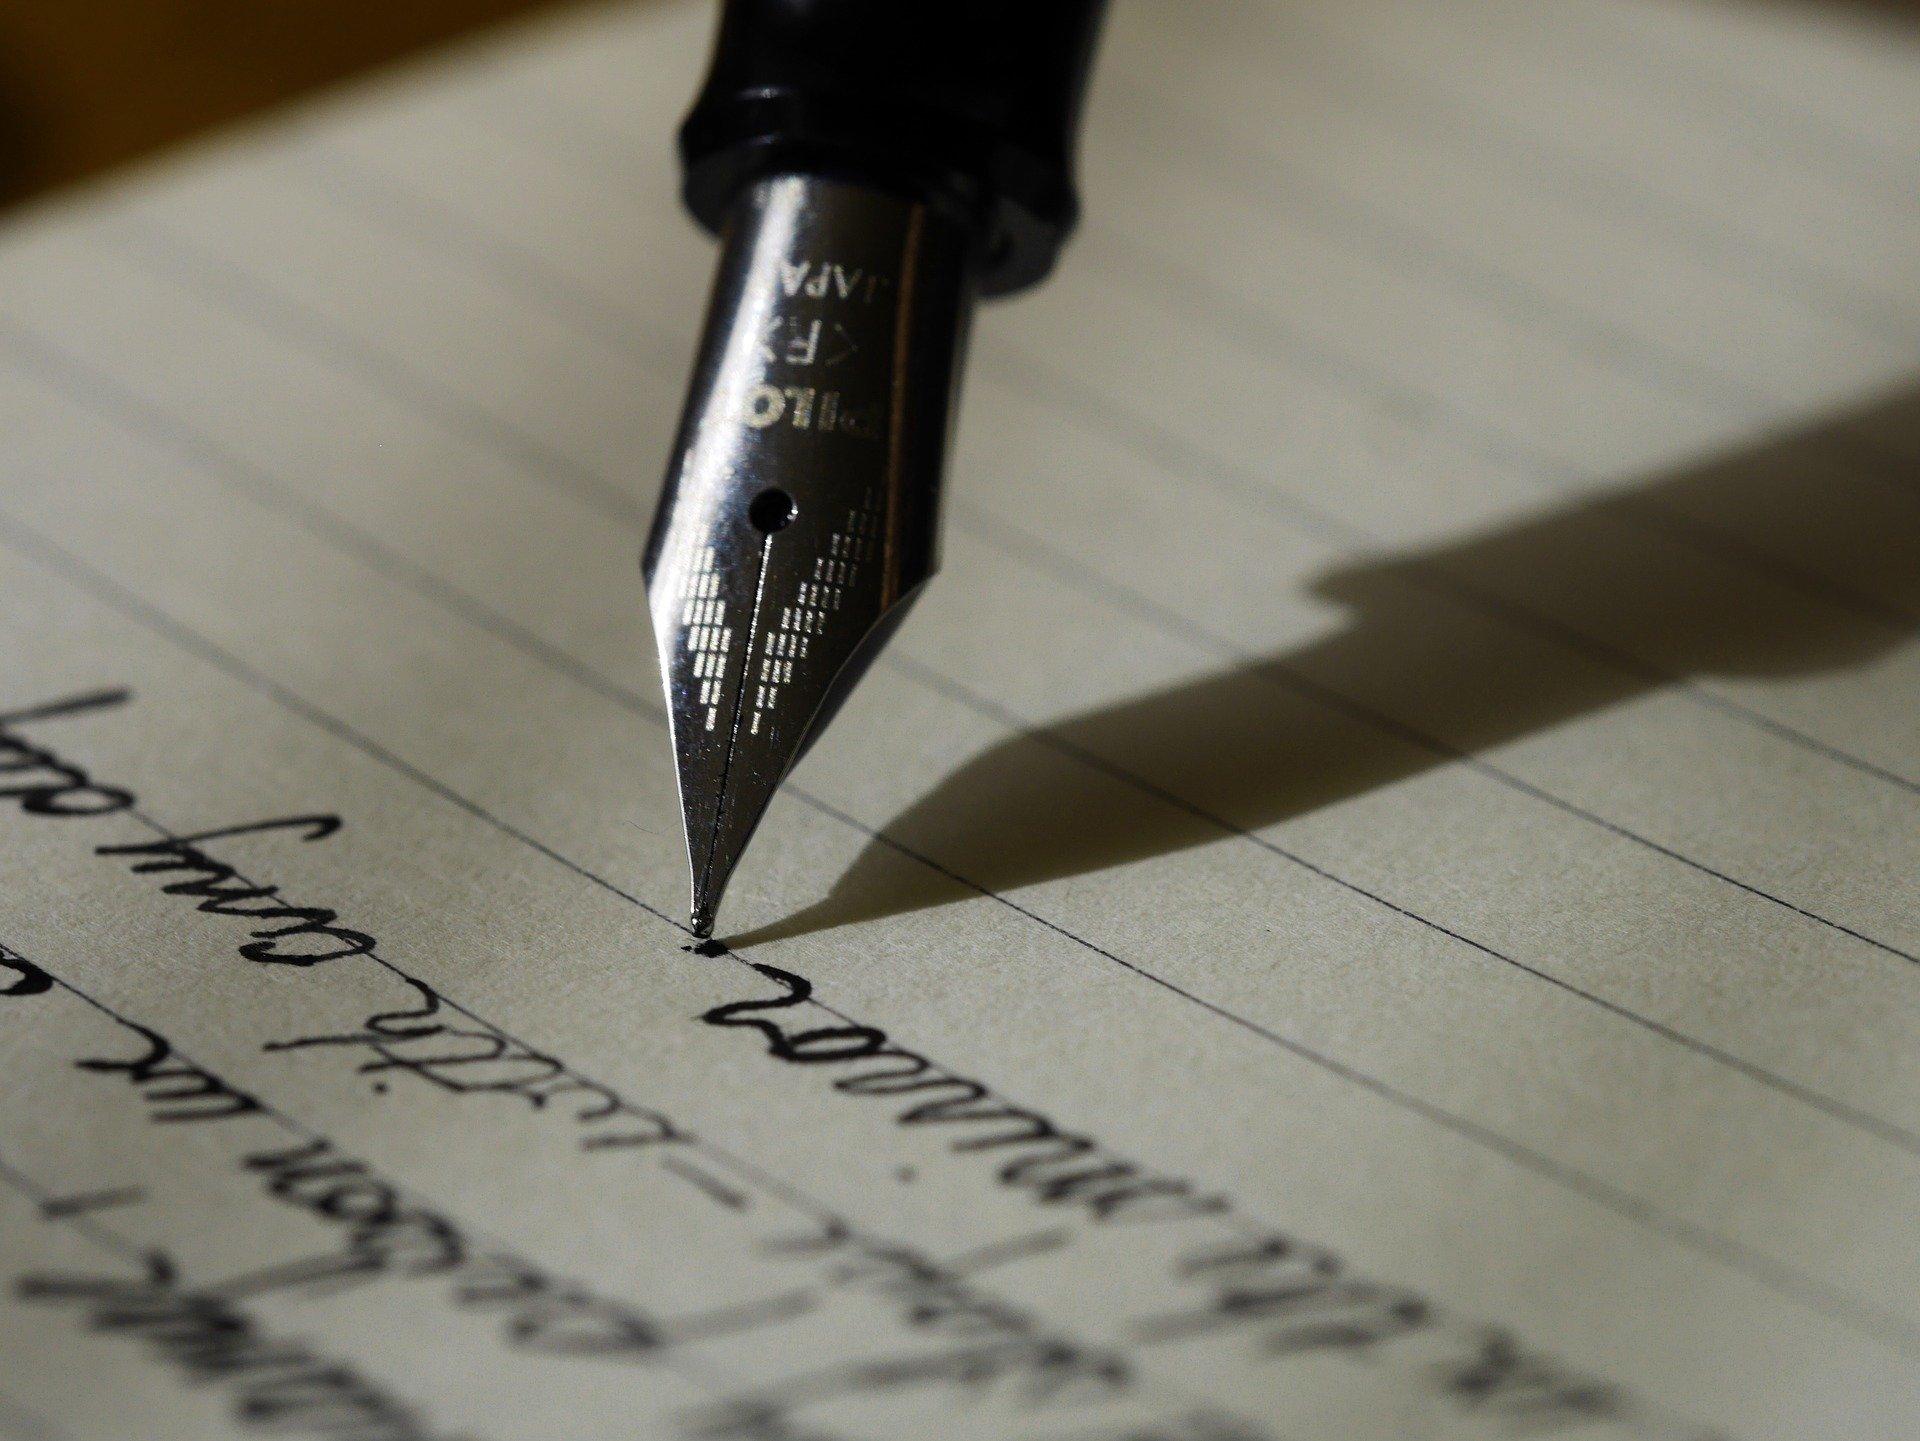 Professional writers